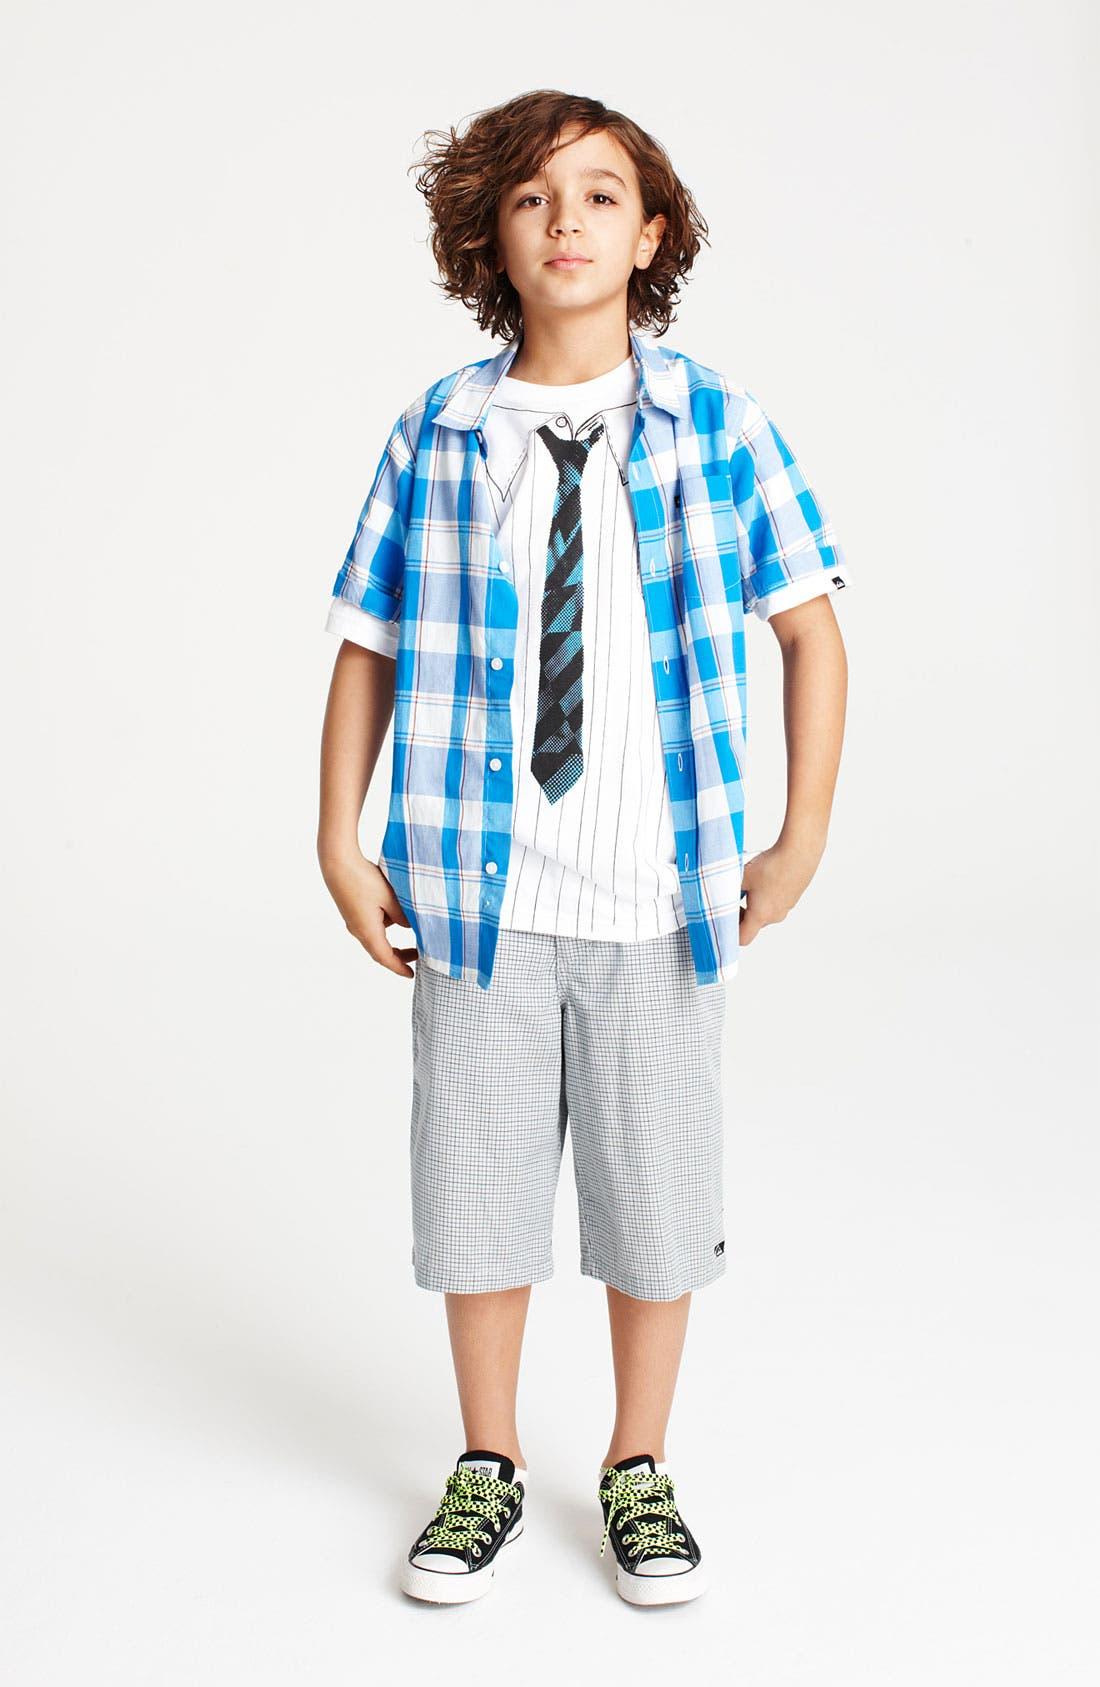 Alternate Image 1 Selected - Quiksilver Woven Shirt & Chambray Shorts (Big Boys)